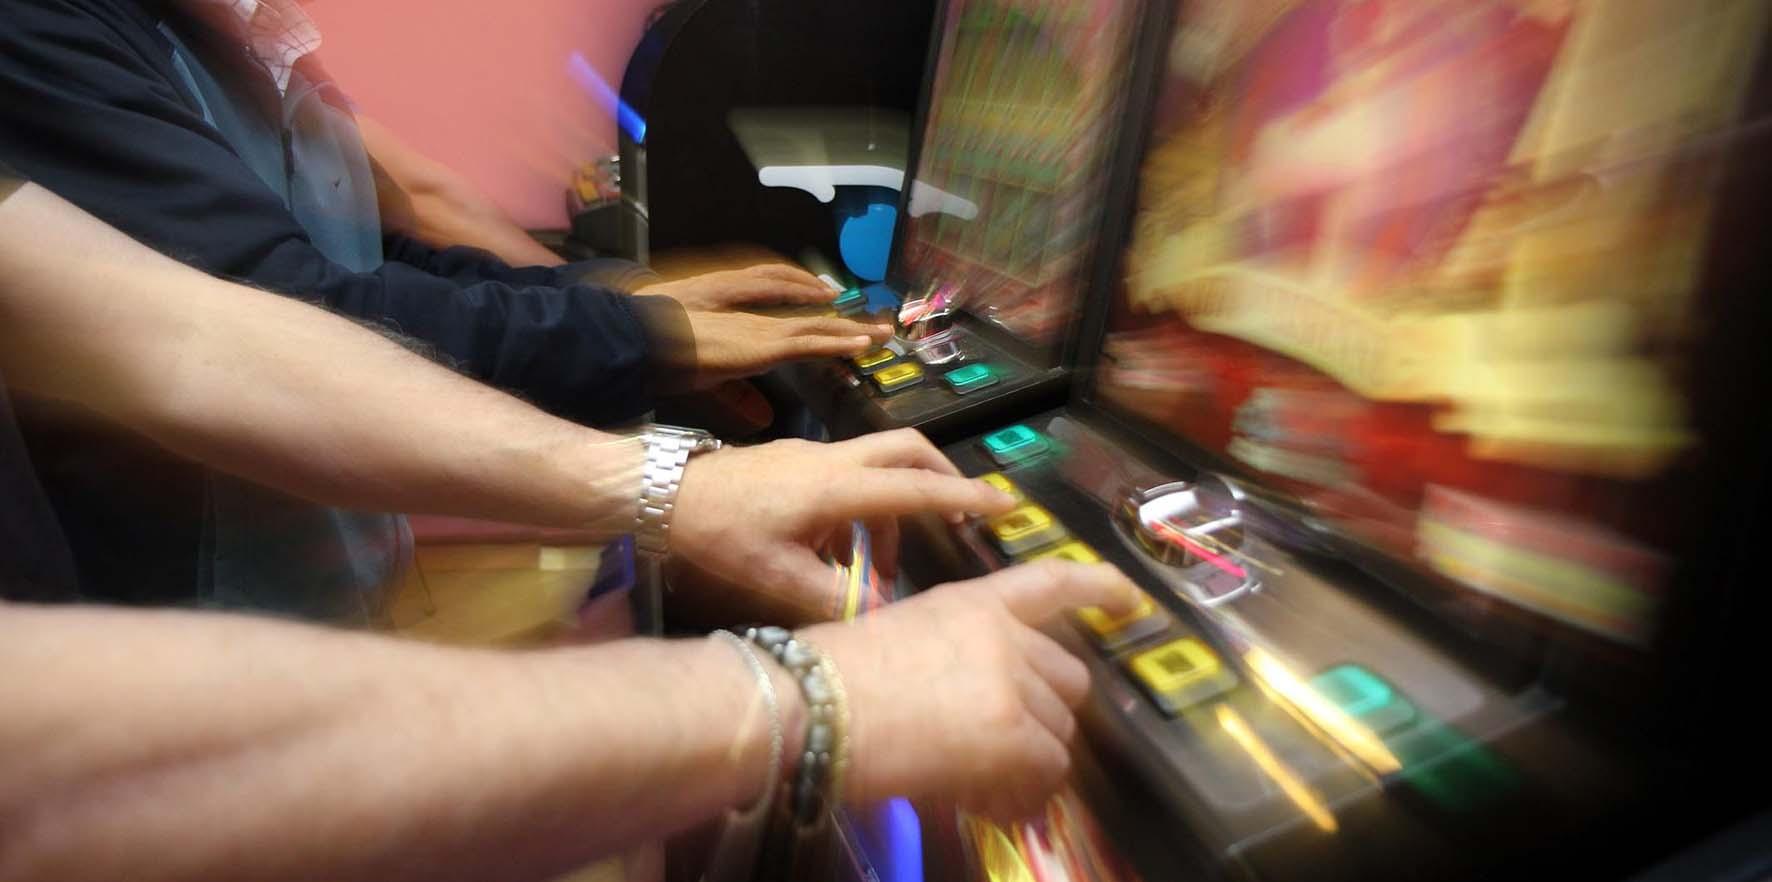 Slot machine gioco azzardo 2